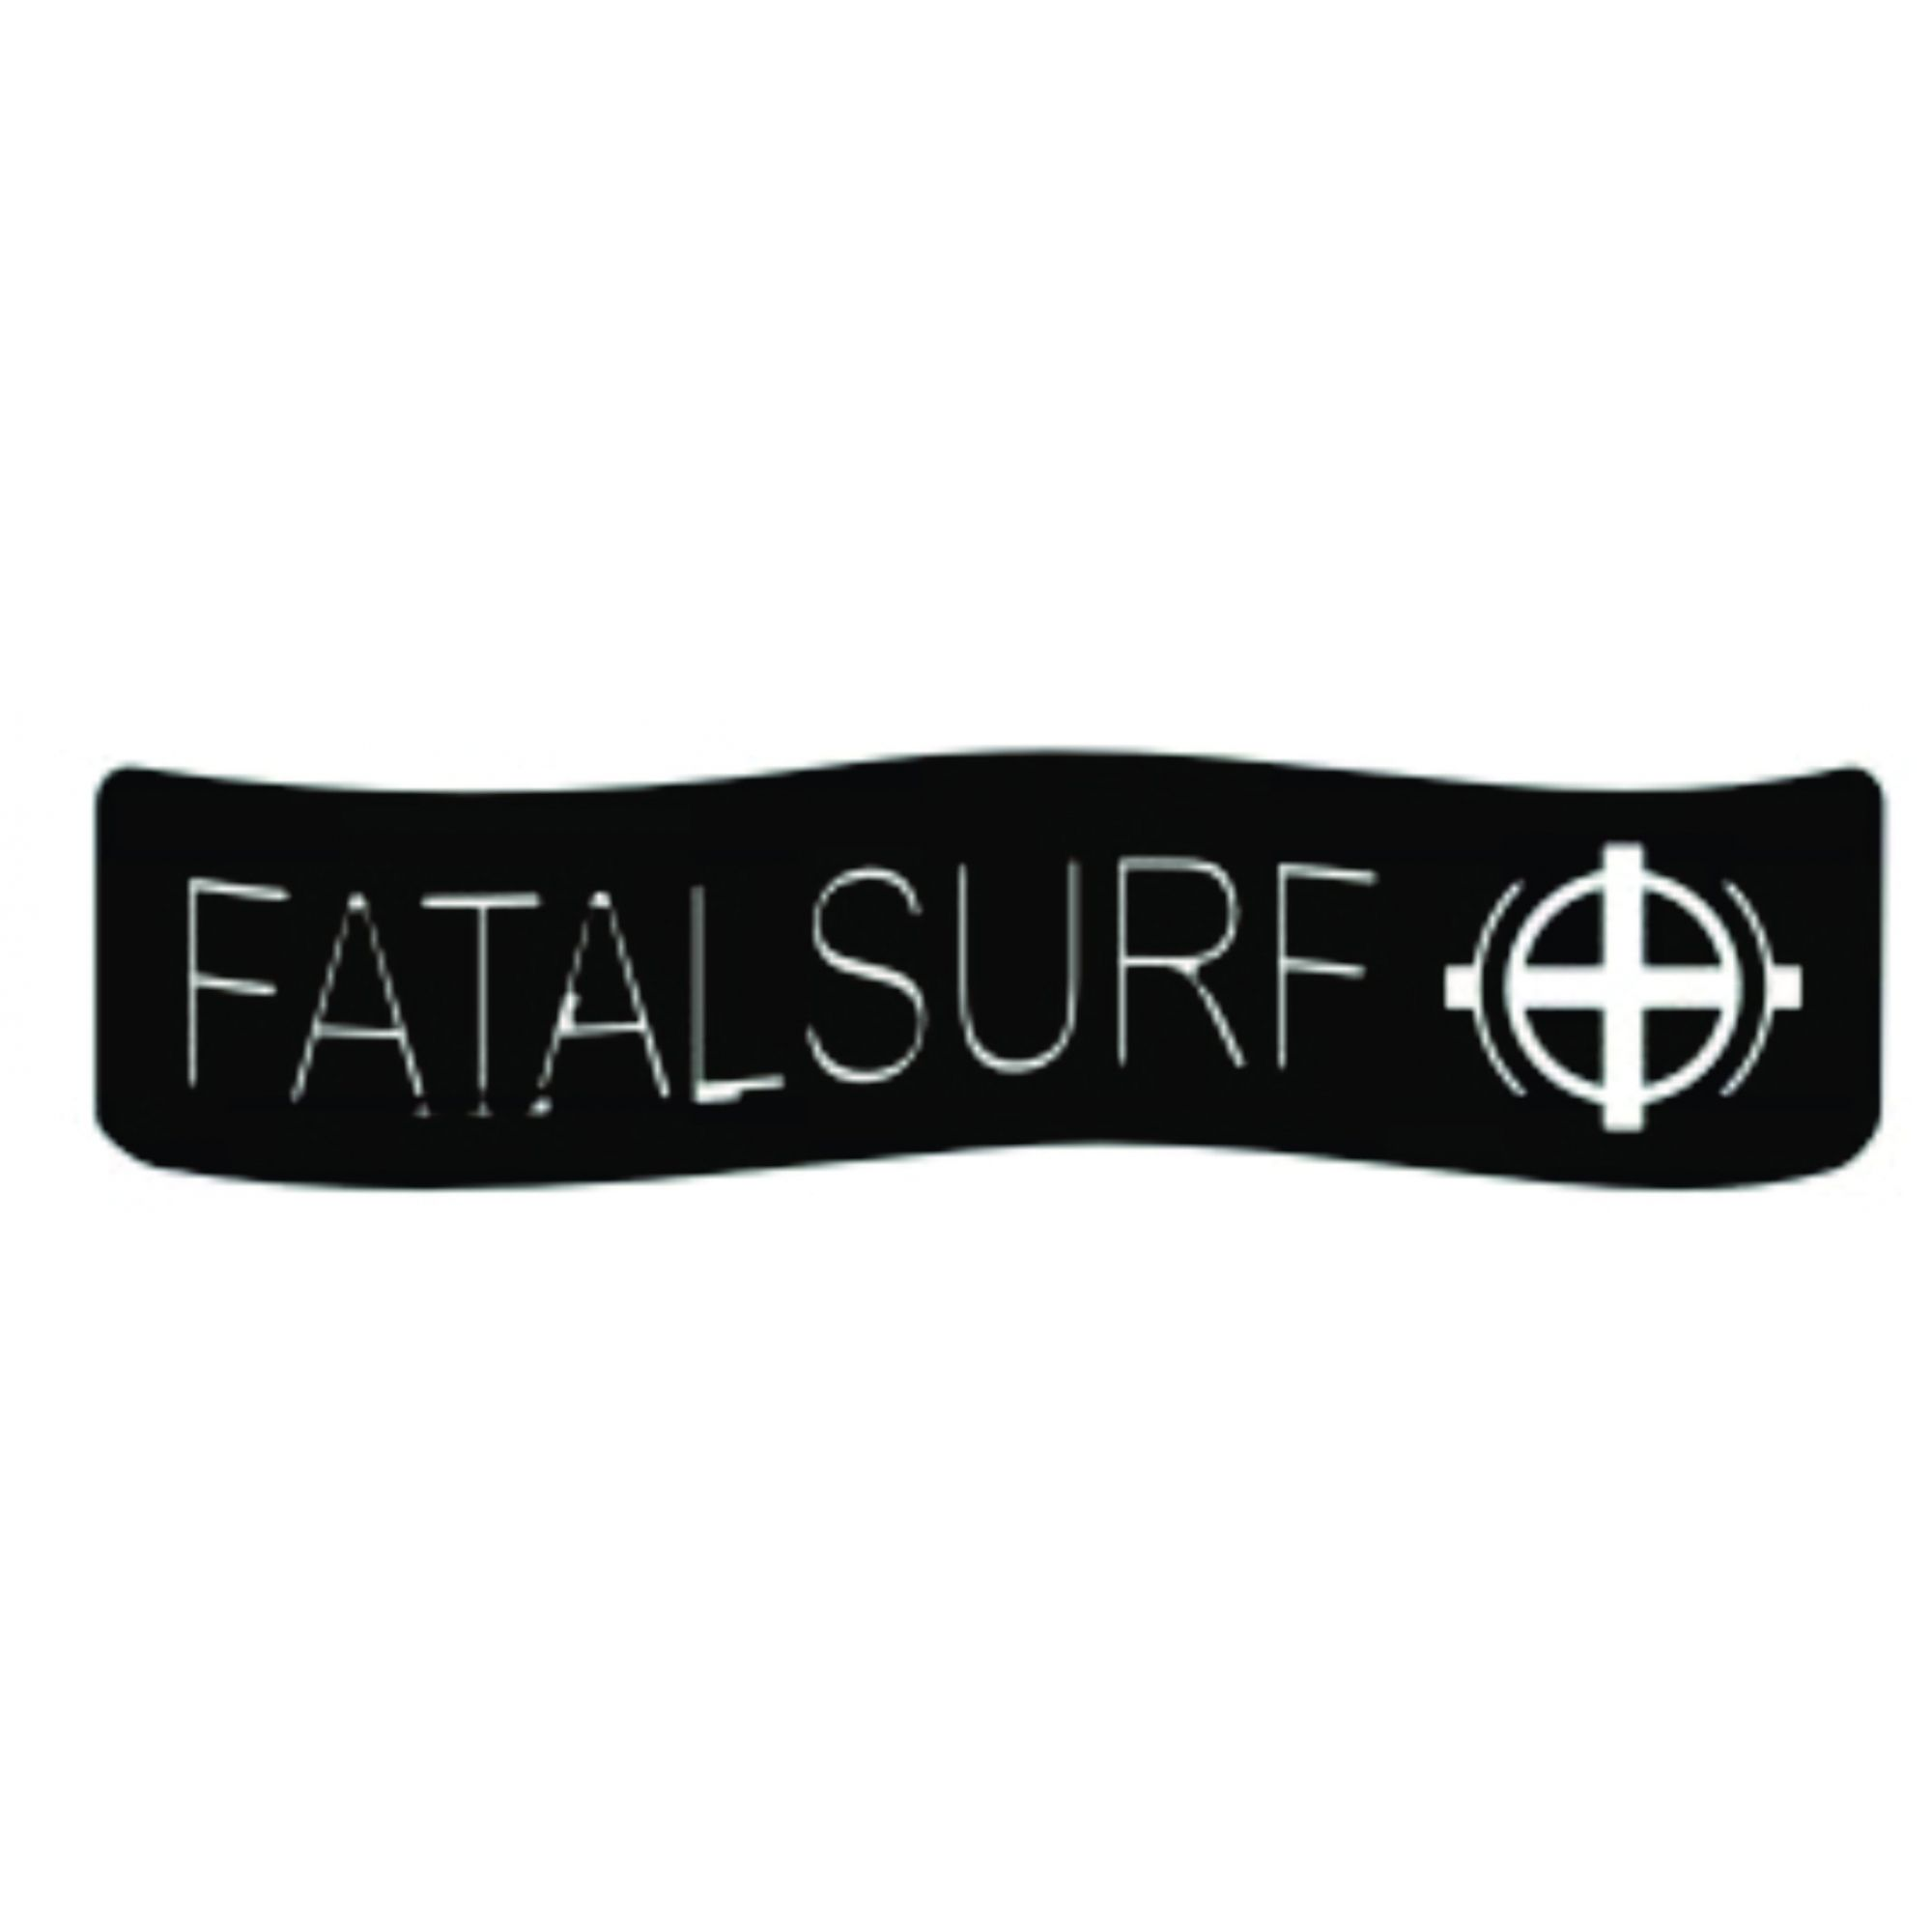 A680 Auto Adesivo Marca Fatal Surf